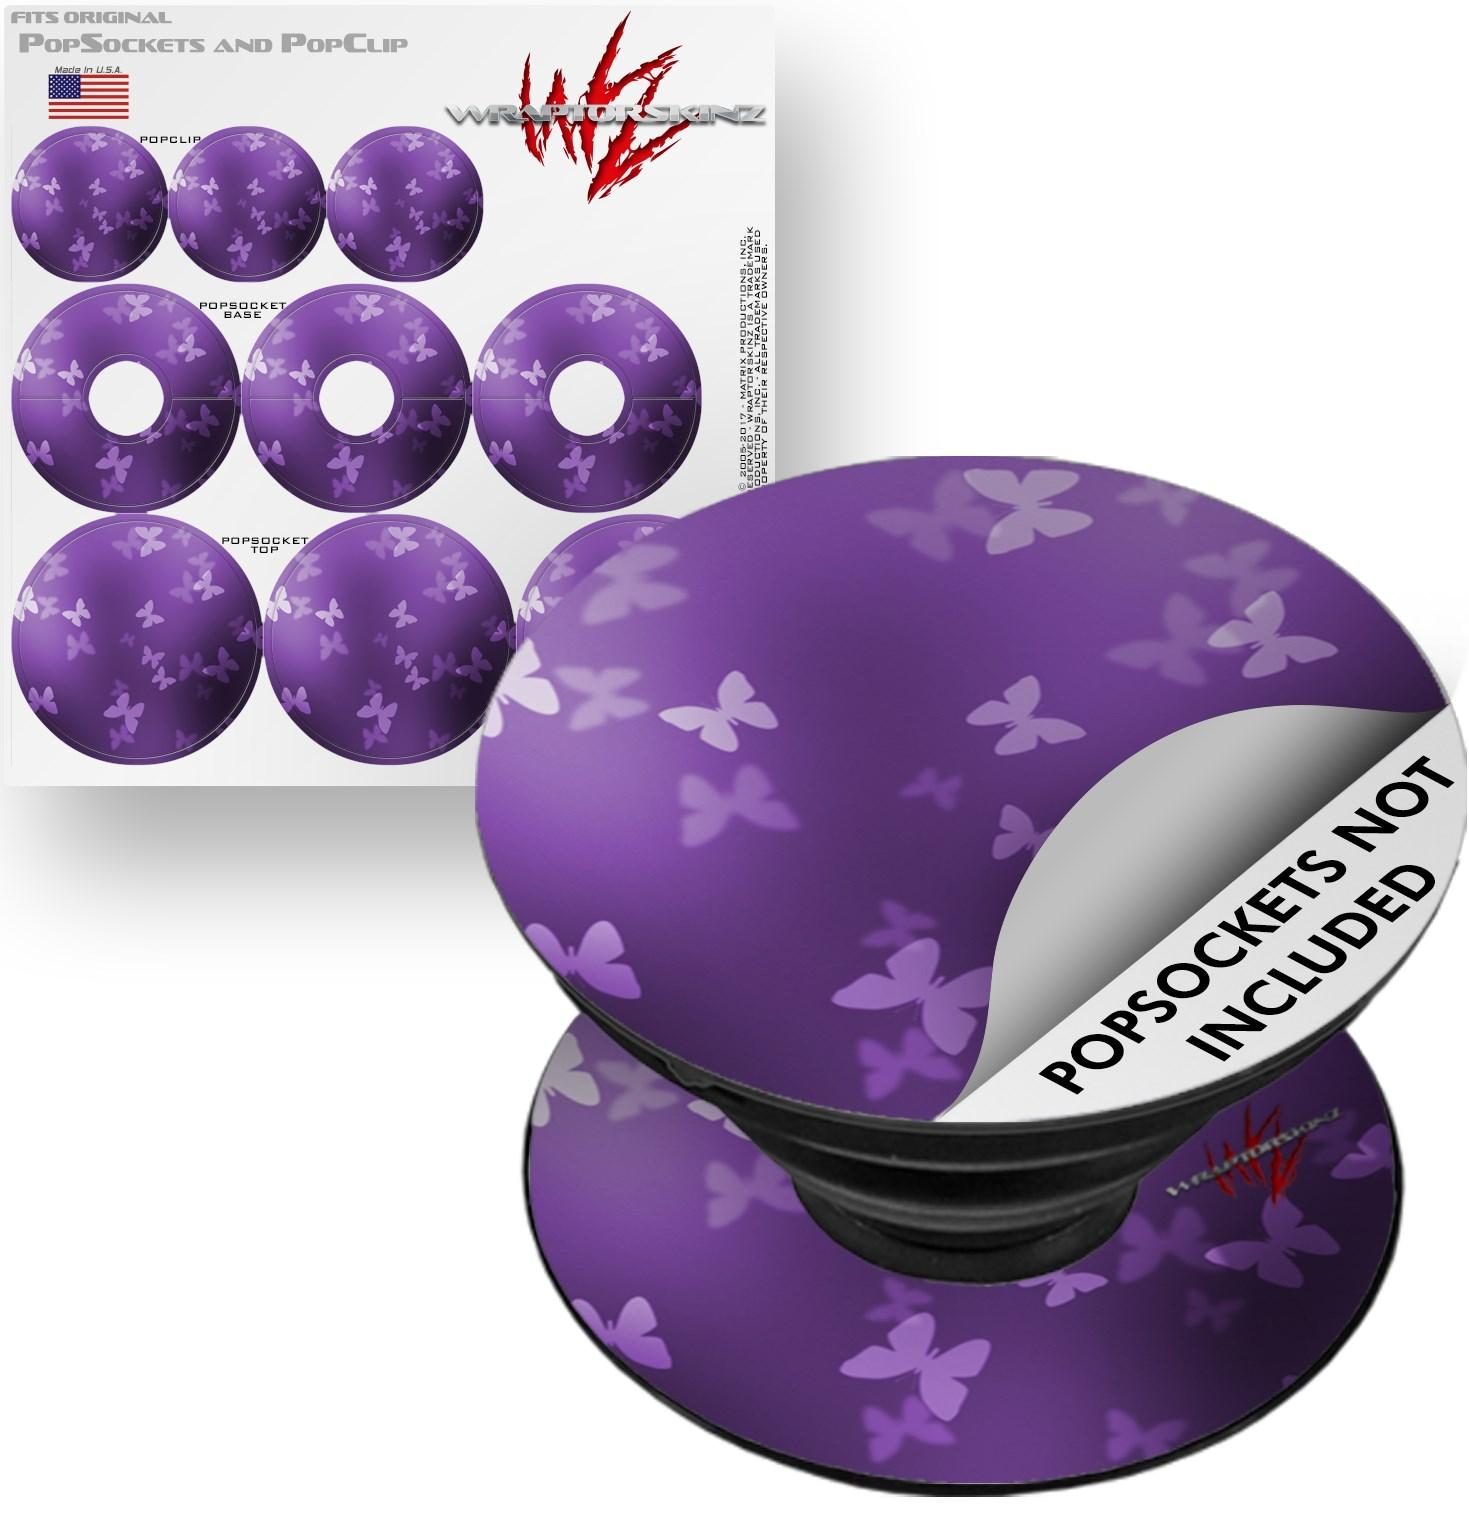 Decal Style Vinyl Skin Wrap 3 Pack for PopSockets Bokeh Butterflies Purple (POPSOCKET NOT INCLUDED) by WraptorSkinz